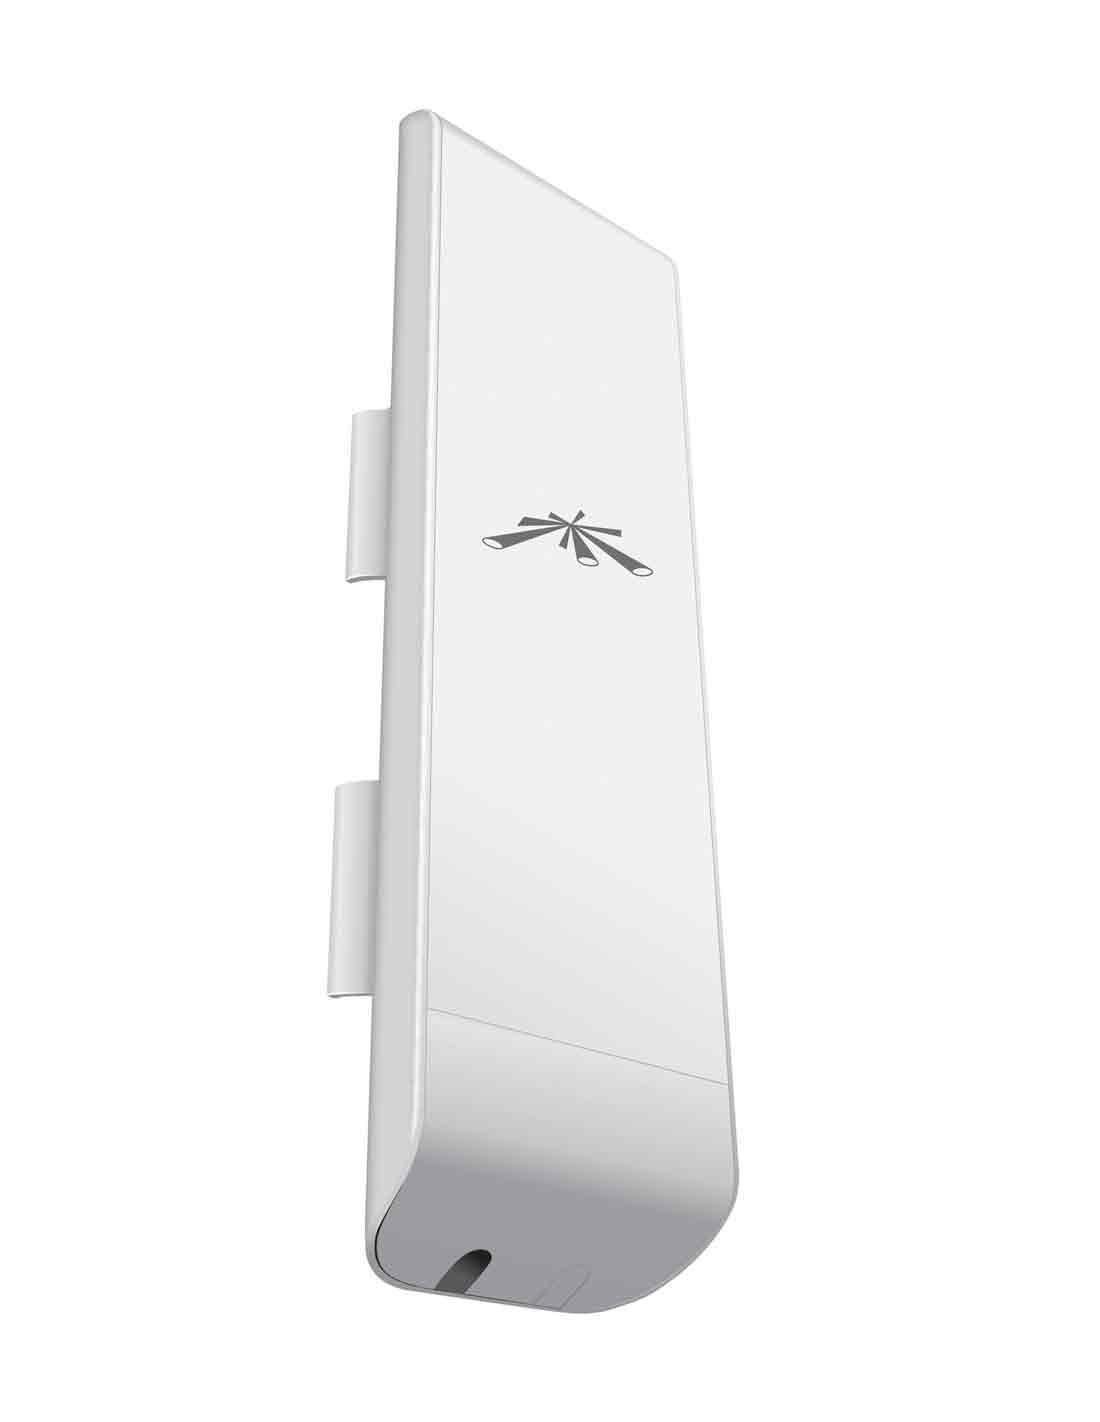 Ubiquiti NanoStation M5 NSM5 5 GHz frequency, 150+ Mbps throughput, 15+ km range